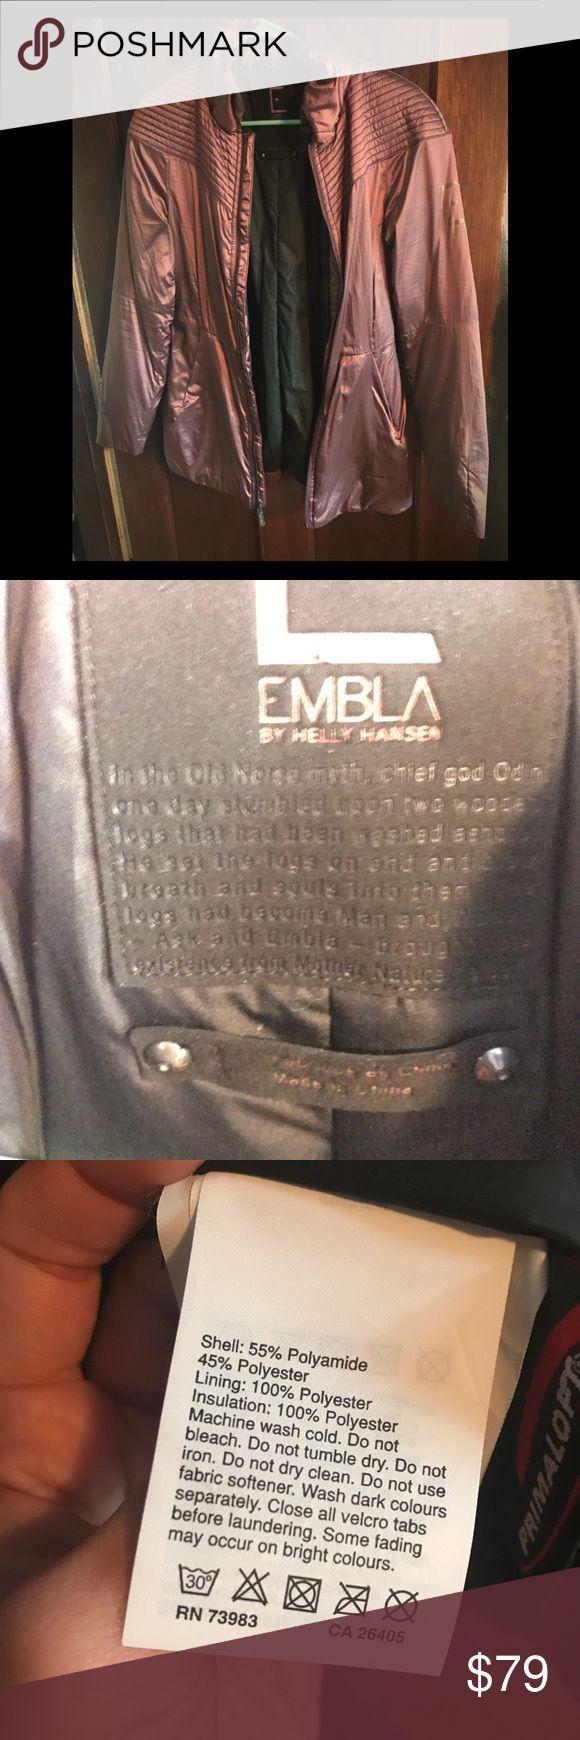 Embla by helly Hansen winter jacket Embla by helly hansen size medium Helly Hansen Jackets & Coats